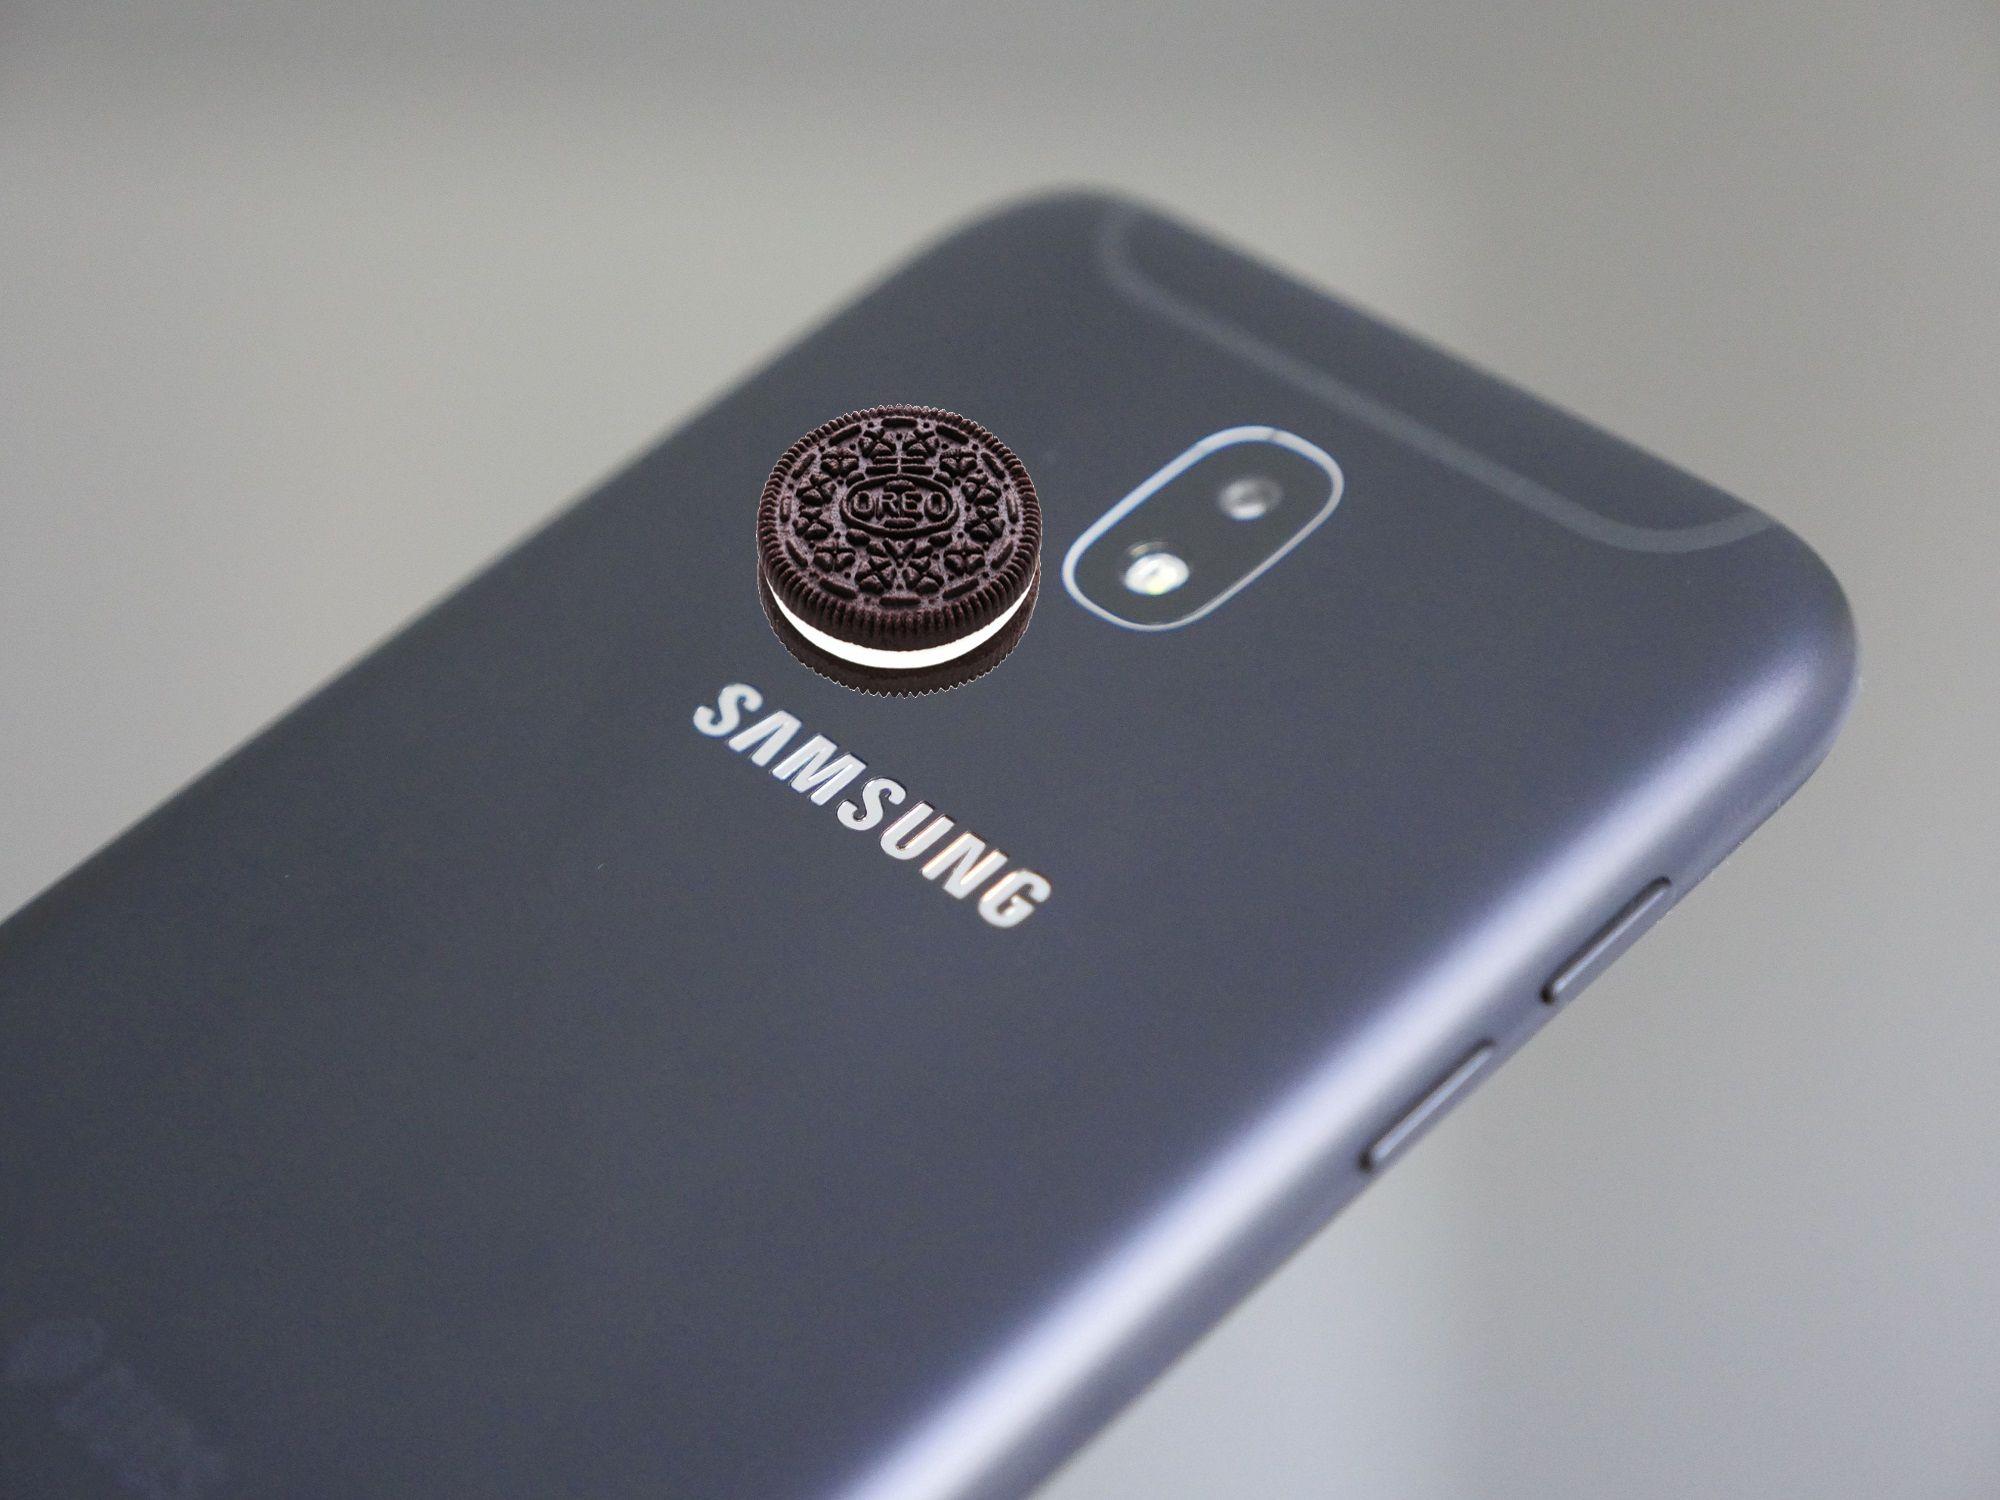 Tabletowo.pl Samsung Galaxy J5 2017 dostaje aktualizację do Androida 8.1 Oreo i Samsung Experience 9.5 Aktualizacje Android Samsung Smartfony